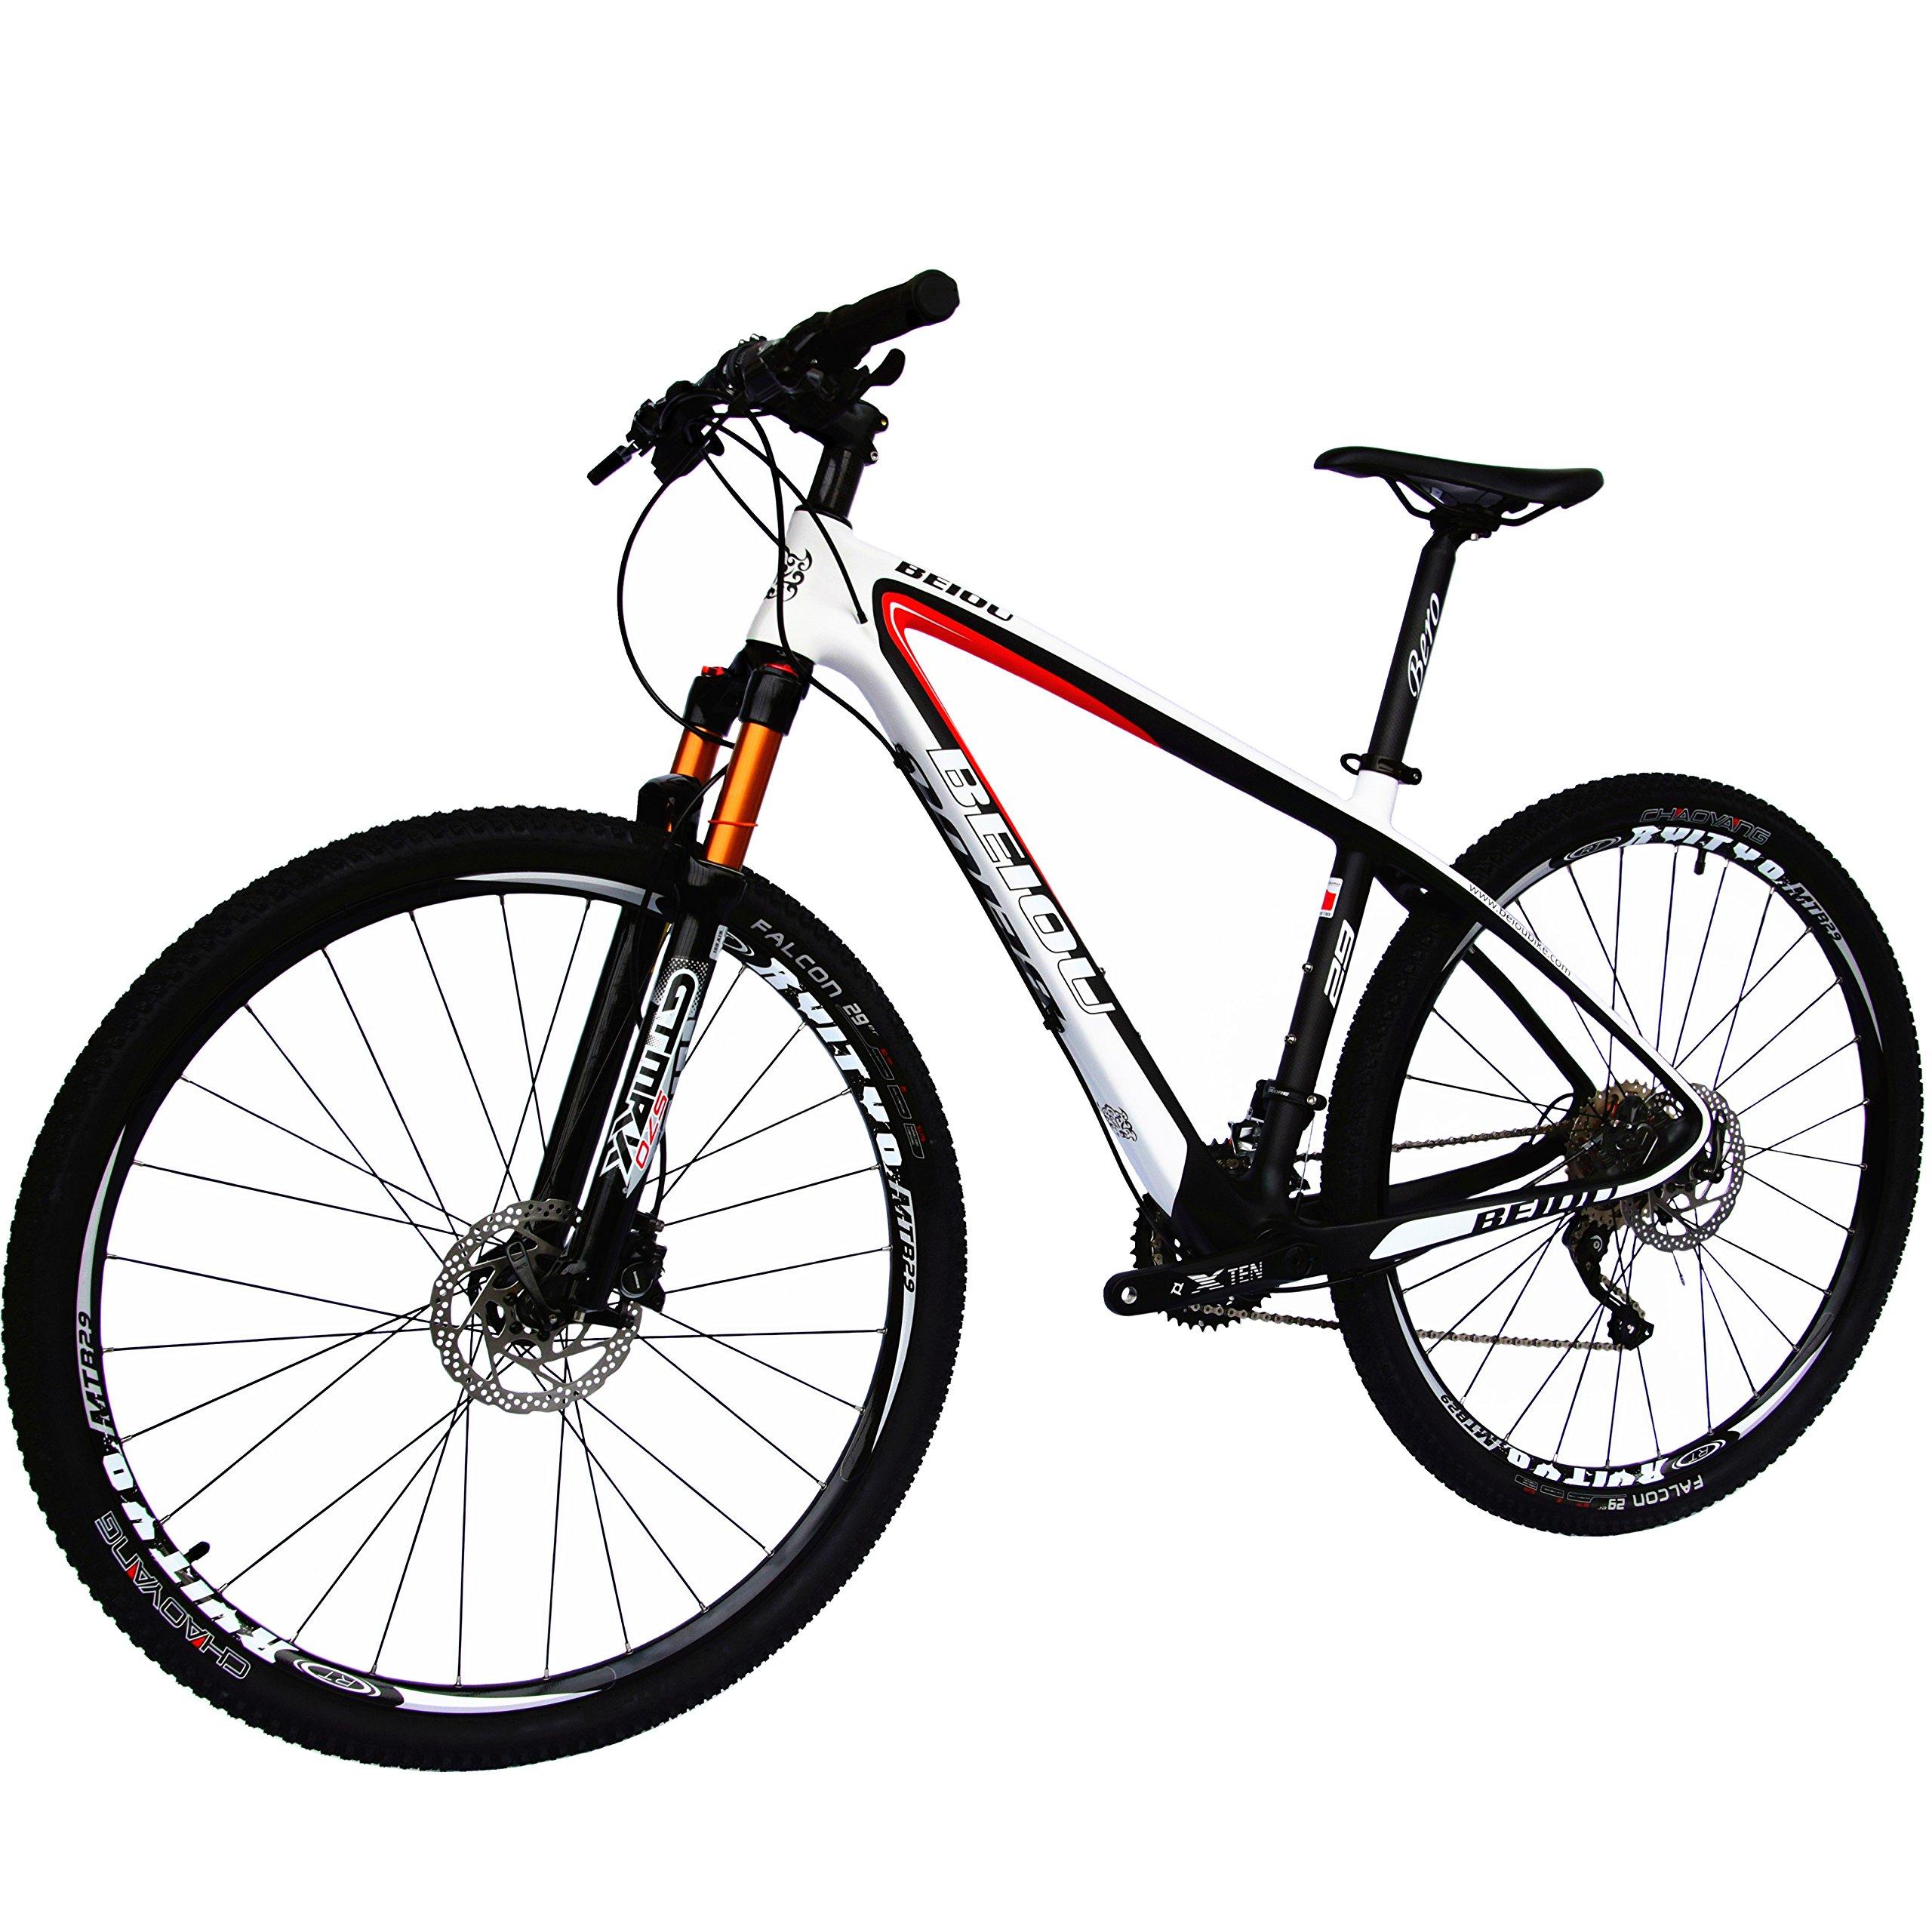 Beiou Carbon Fiber Mountain Bike Review 3